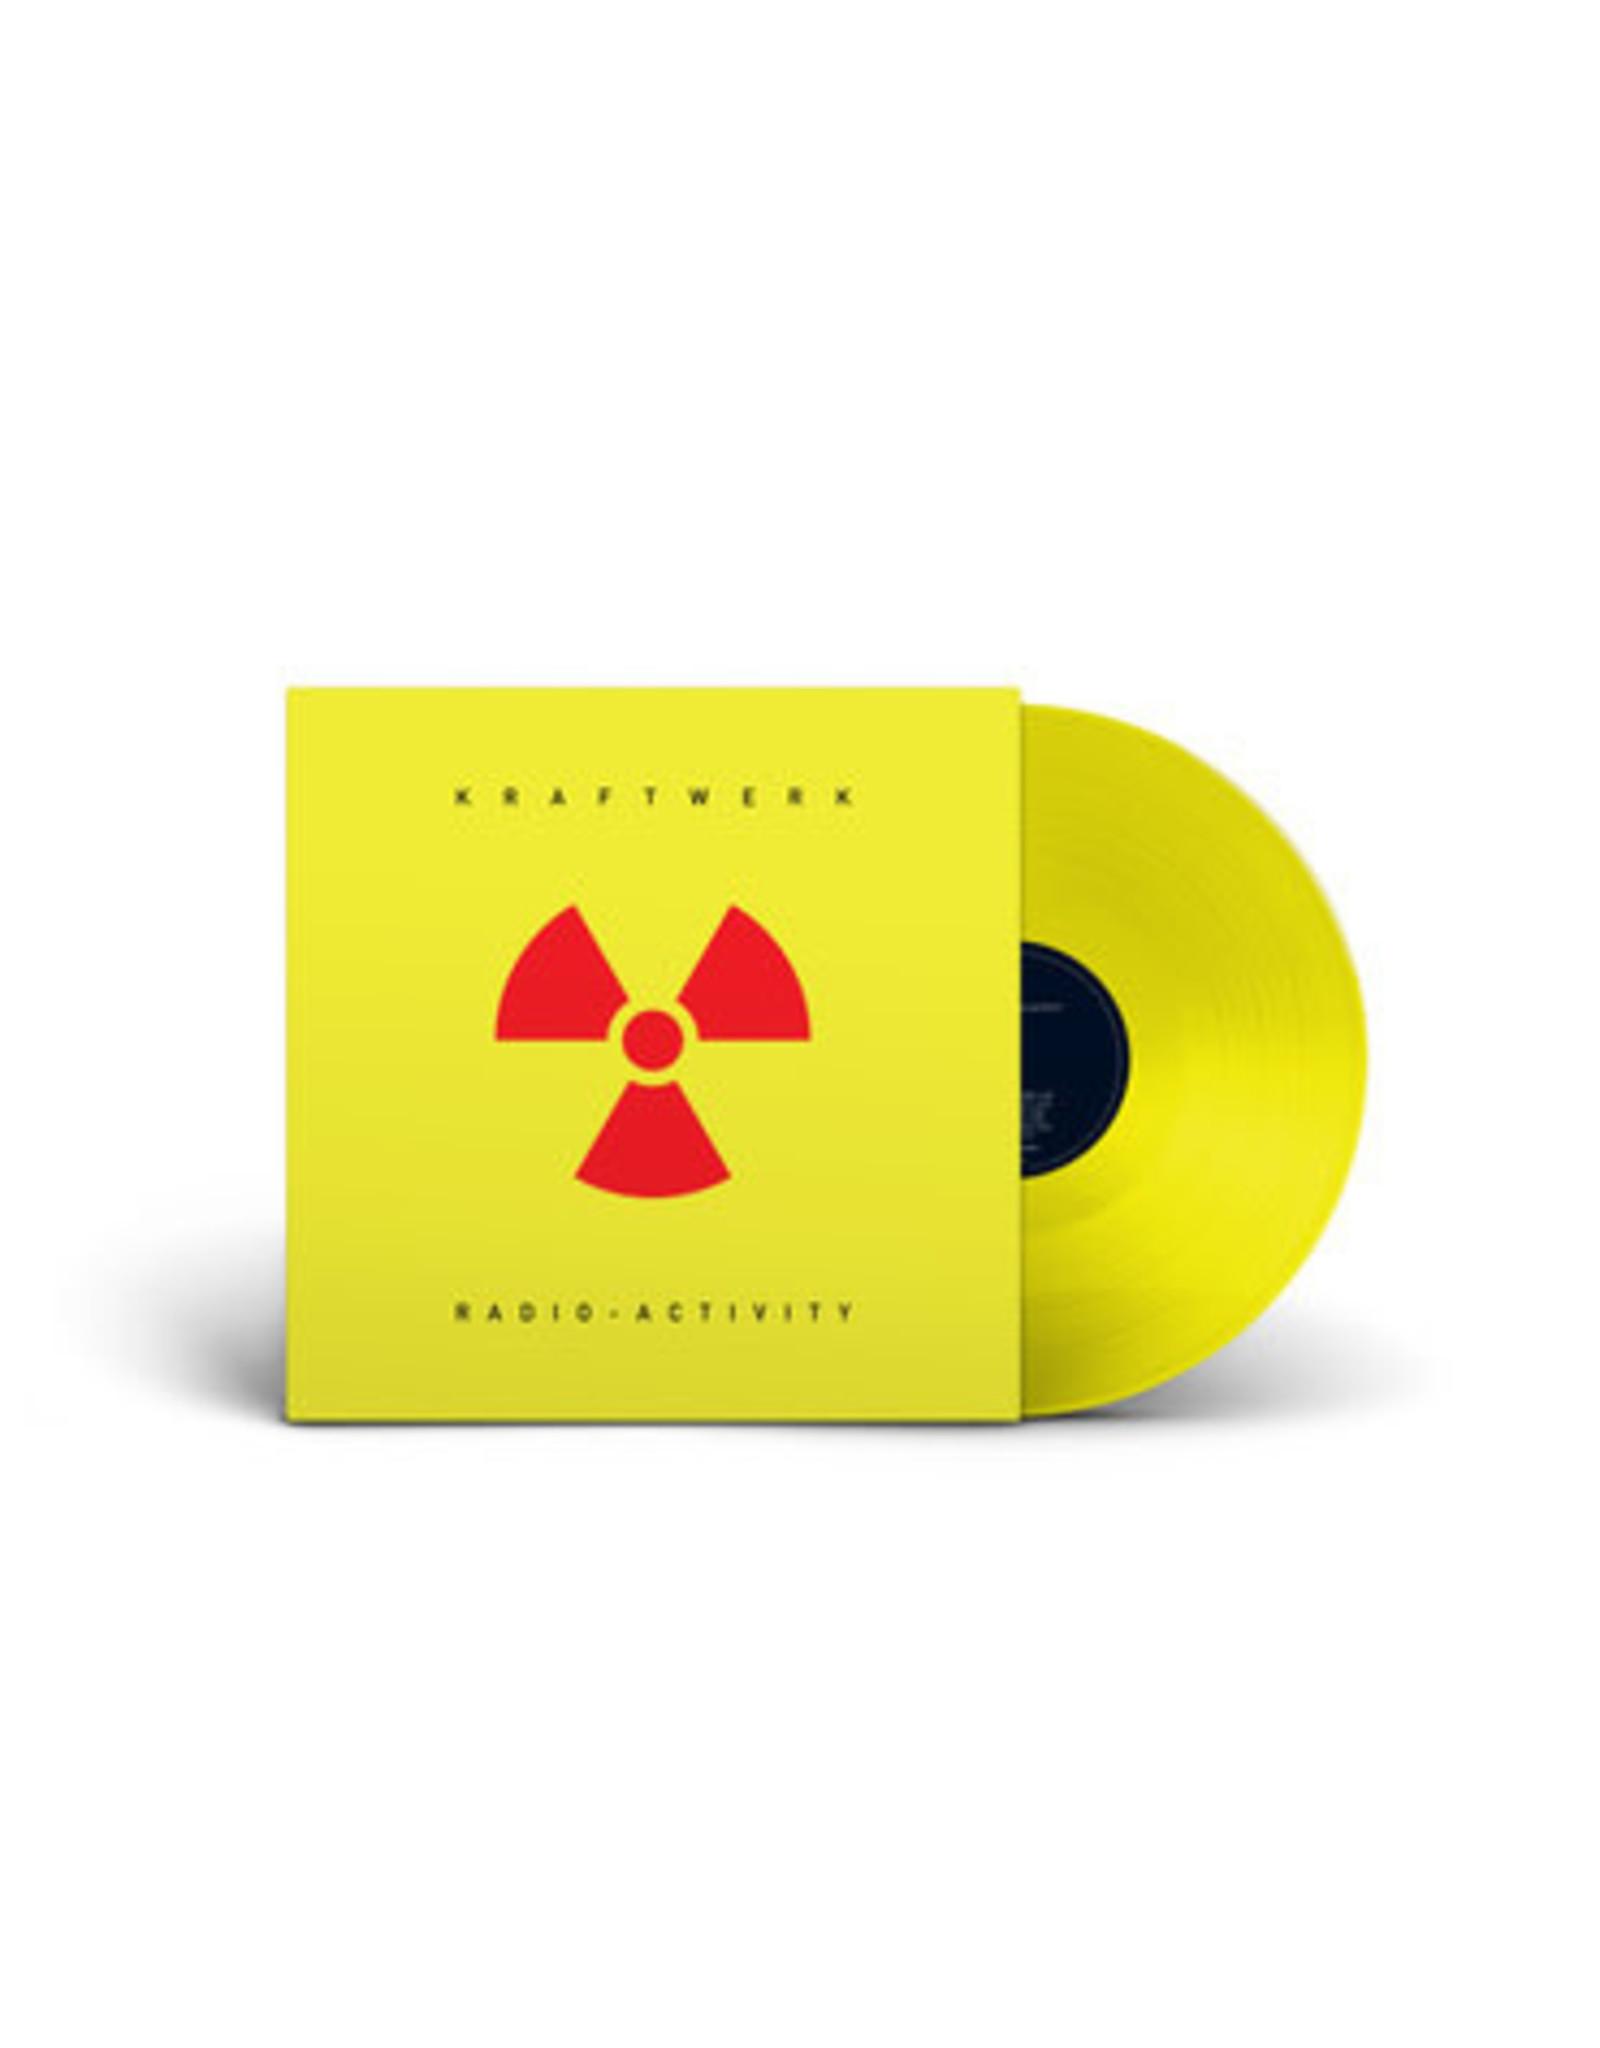 Kraftwerk - Radio-Activity (Ltd 180g Yellow Transparent Vinyl)